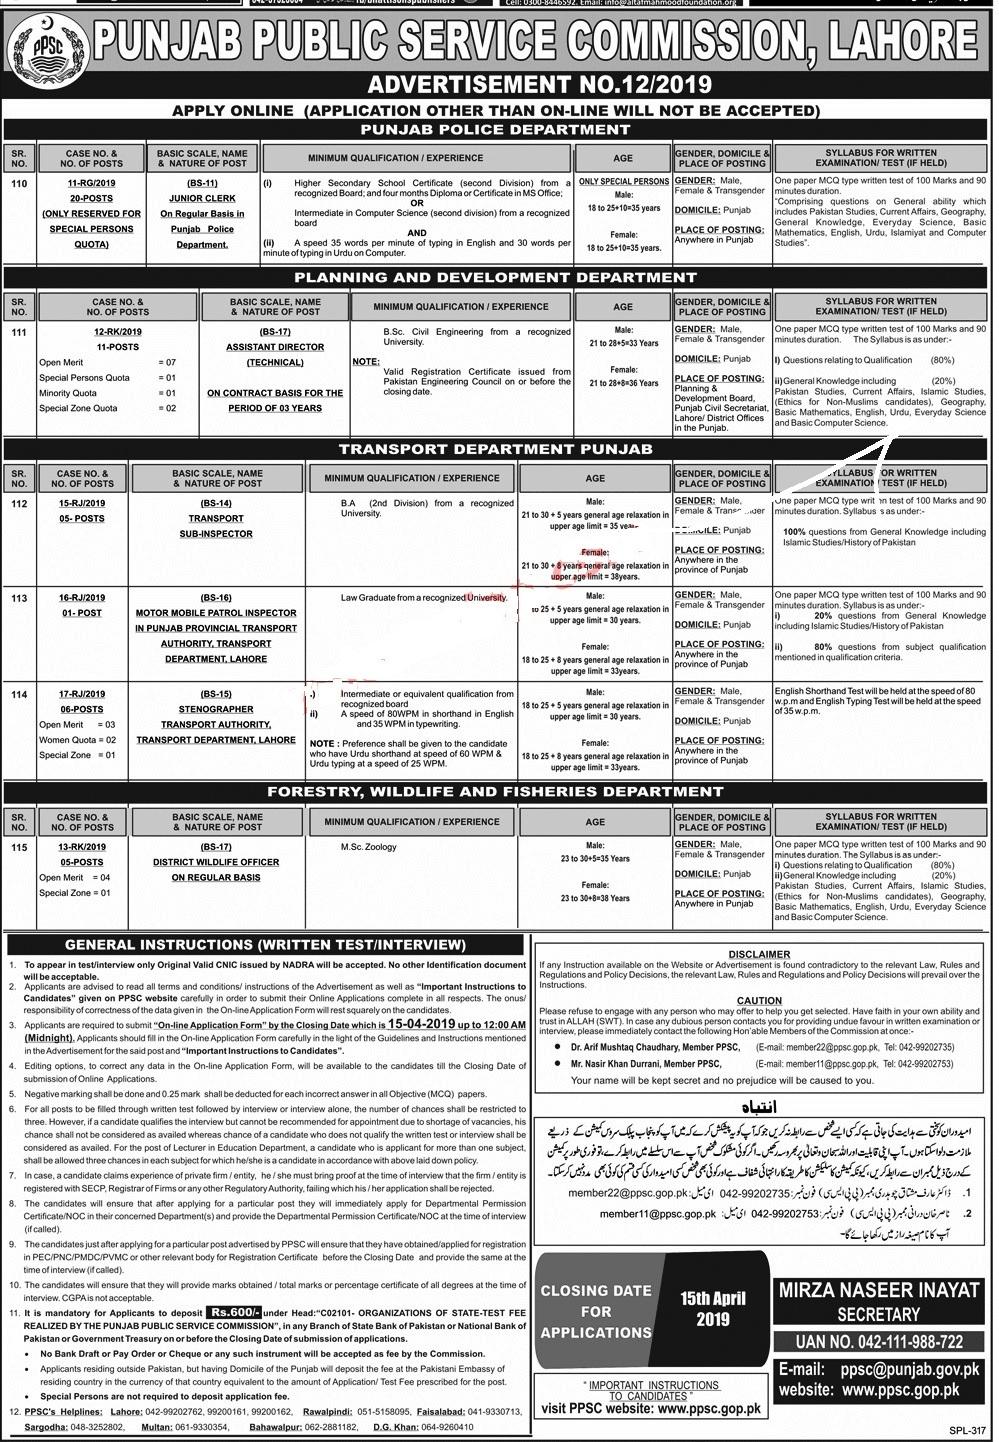 PPSC Punjab Police Clerk & Transport Sub-Inspector April Jobs 2019 : Vacancies 48